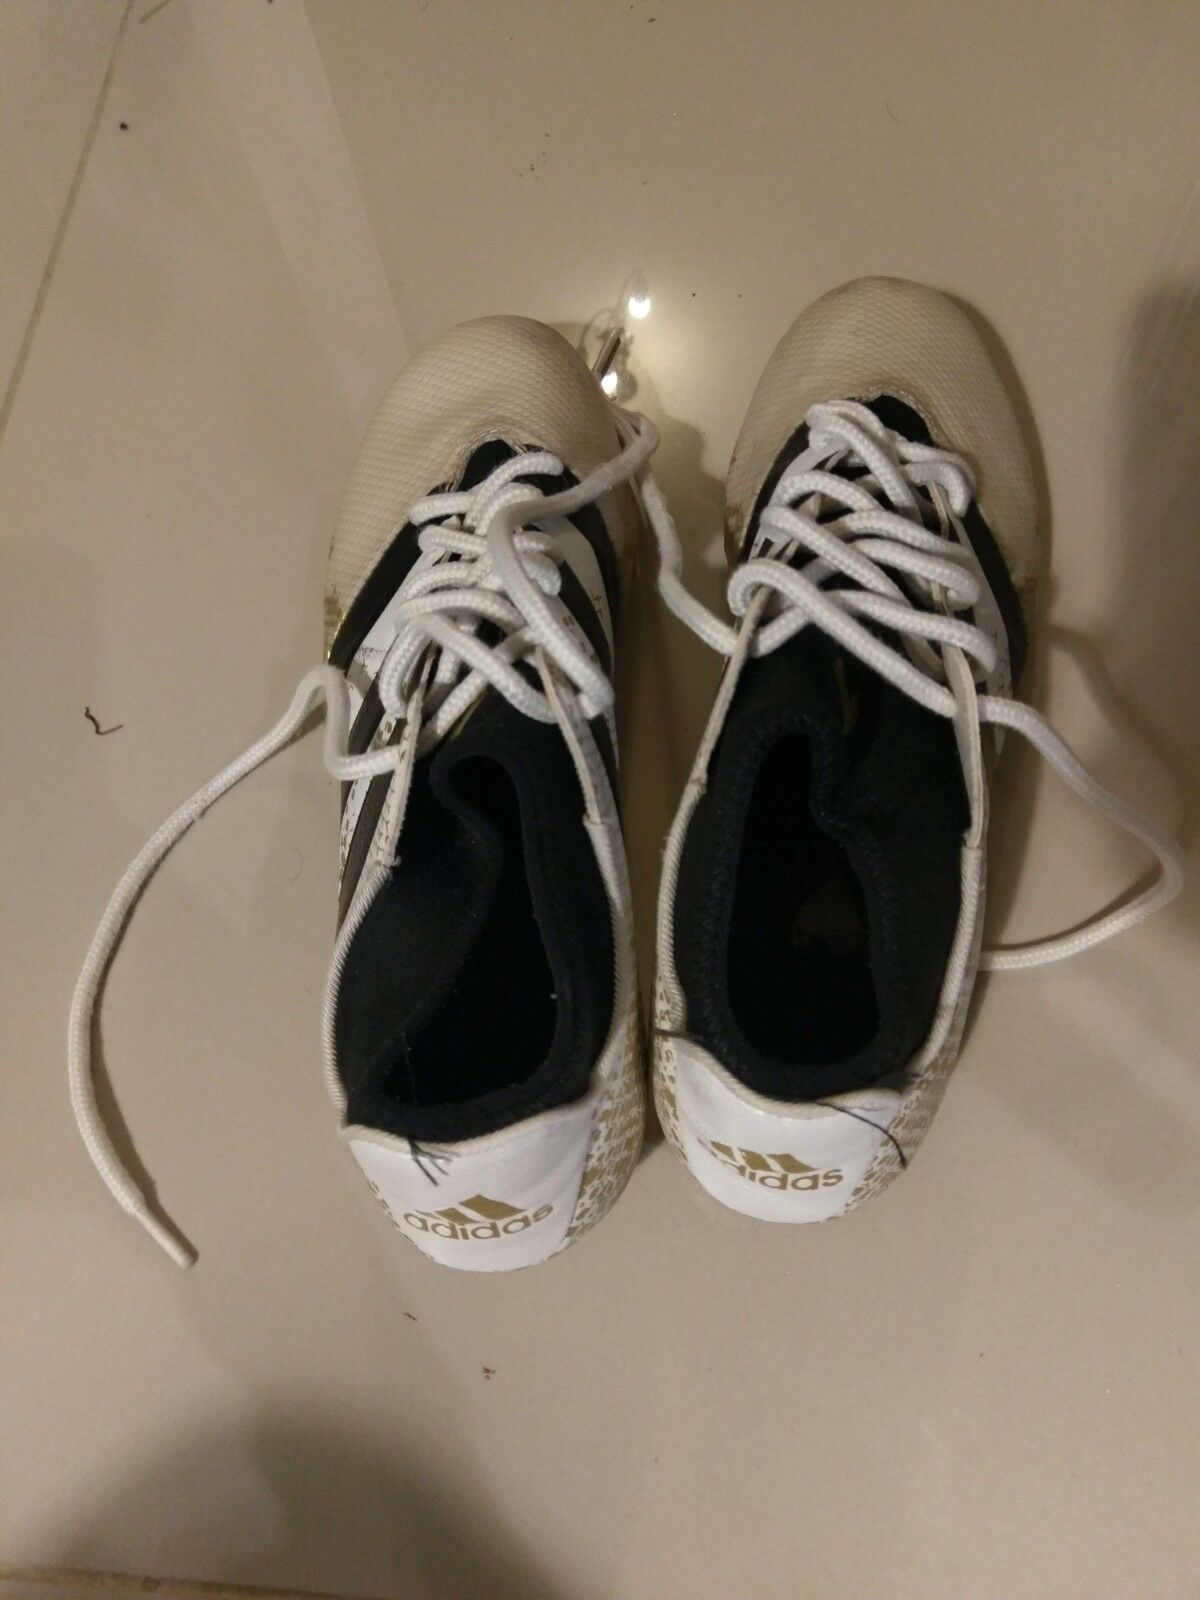 f18584eba Adidas Ace 16.3 Primemesh FG AG Mens Football Boots nznbwp8200 ...